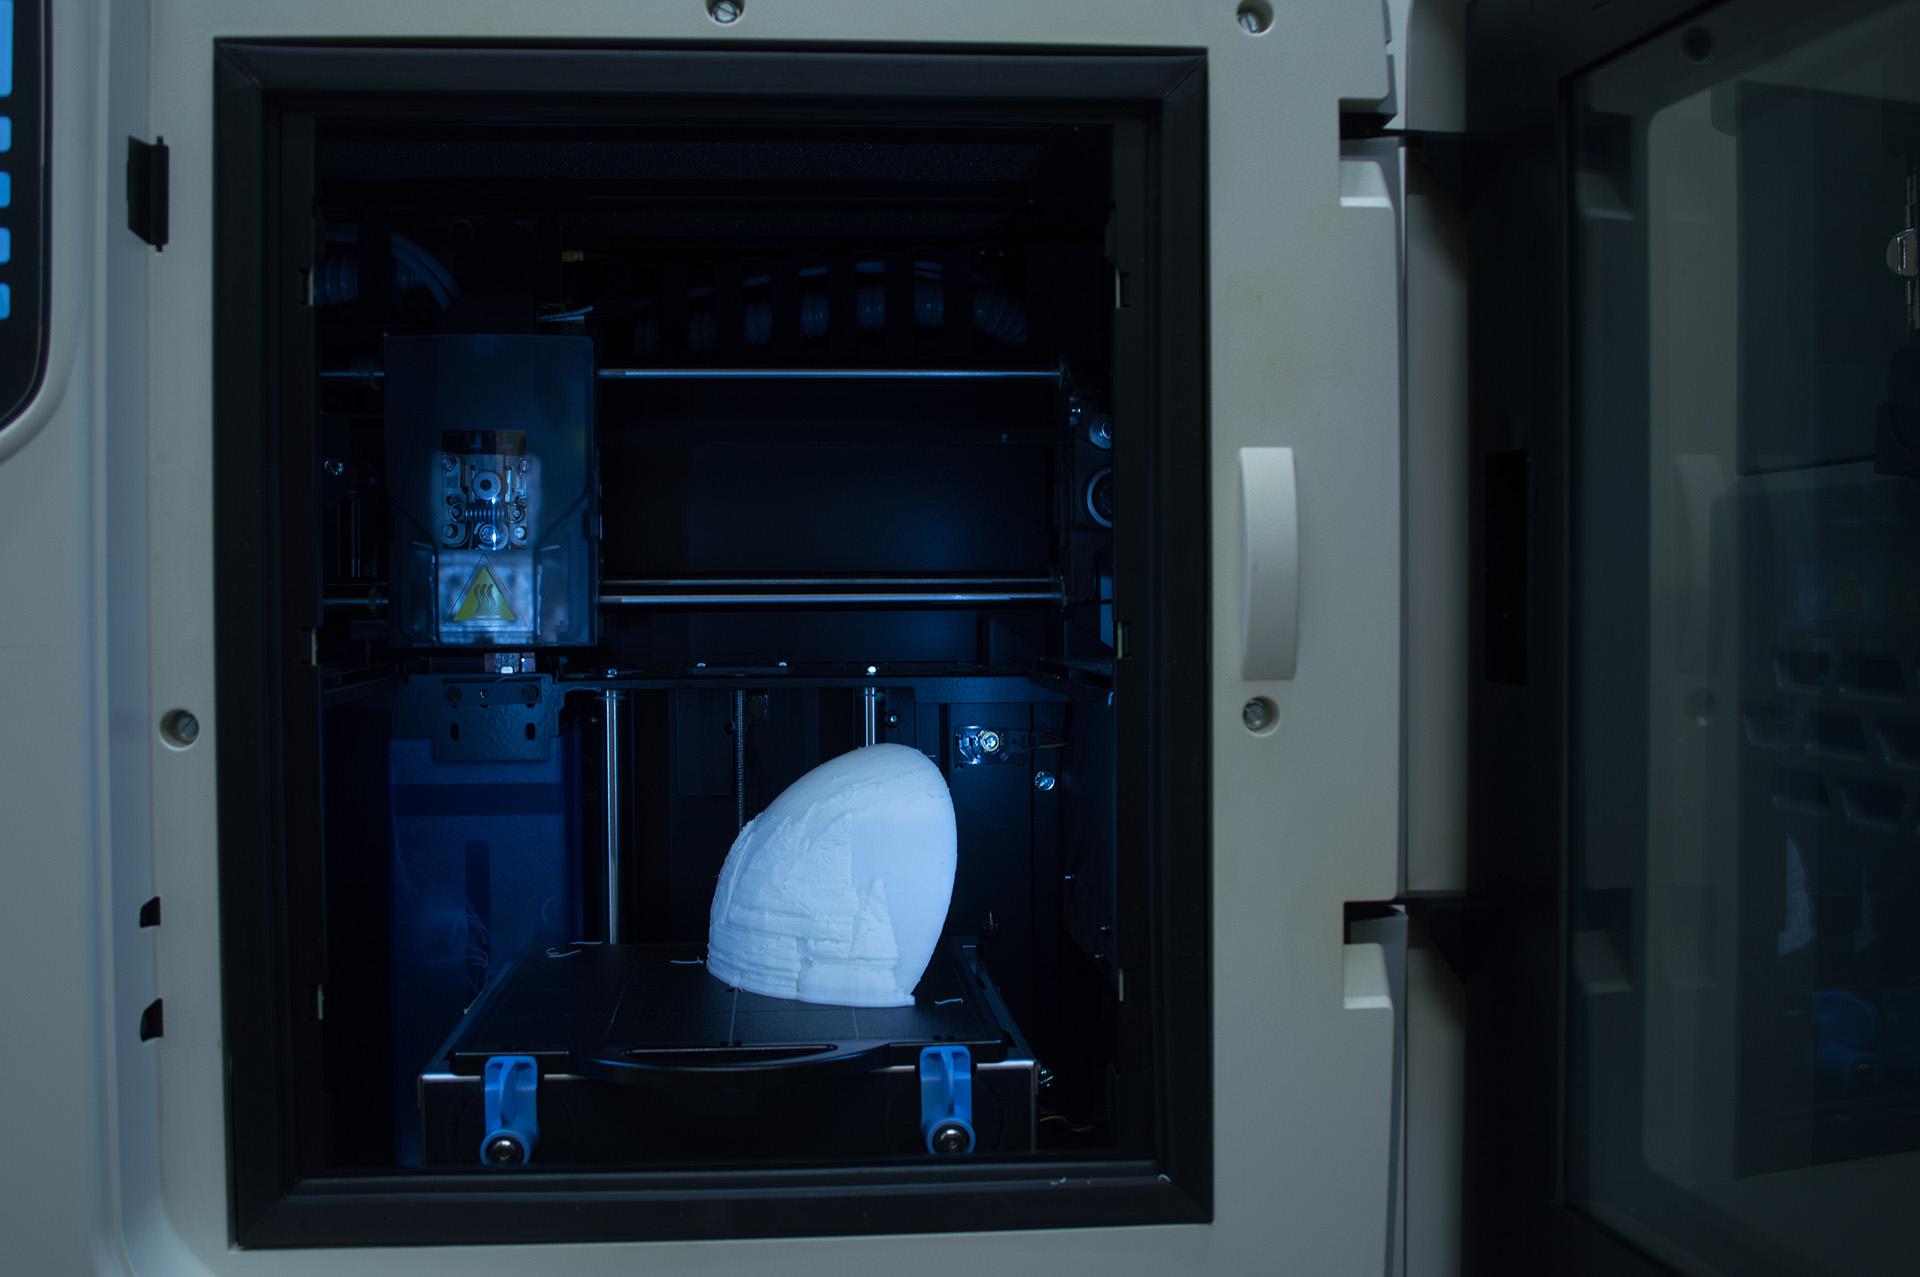 Ian-Nakamoto-Greg-Snider-Globe-3d-Printer-bed-small